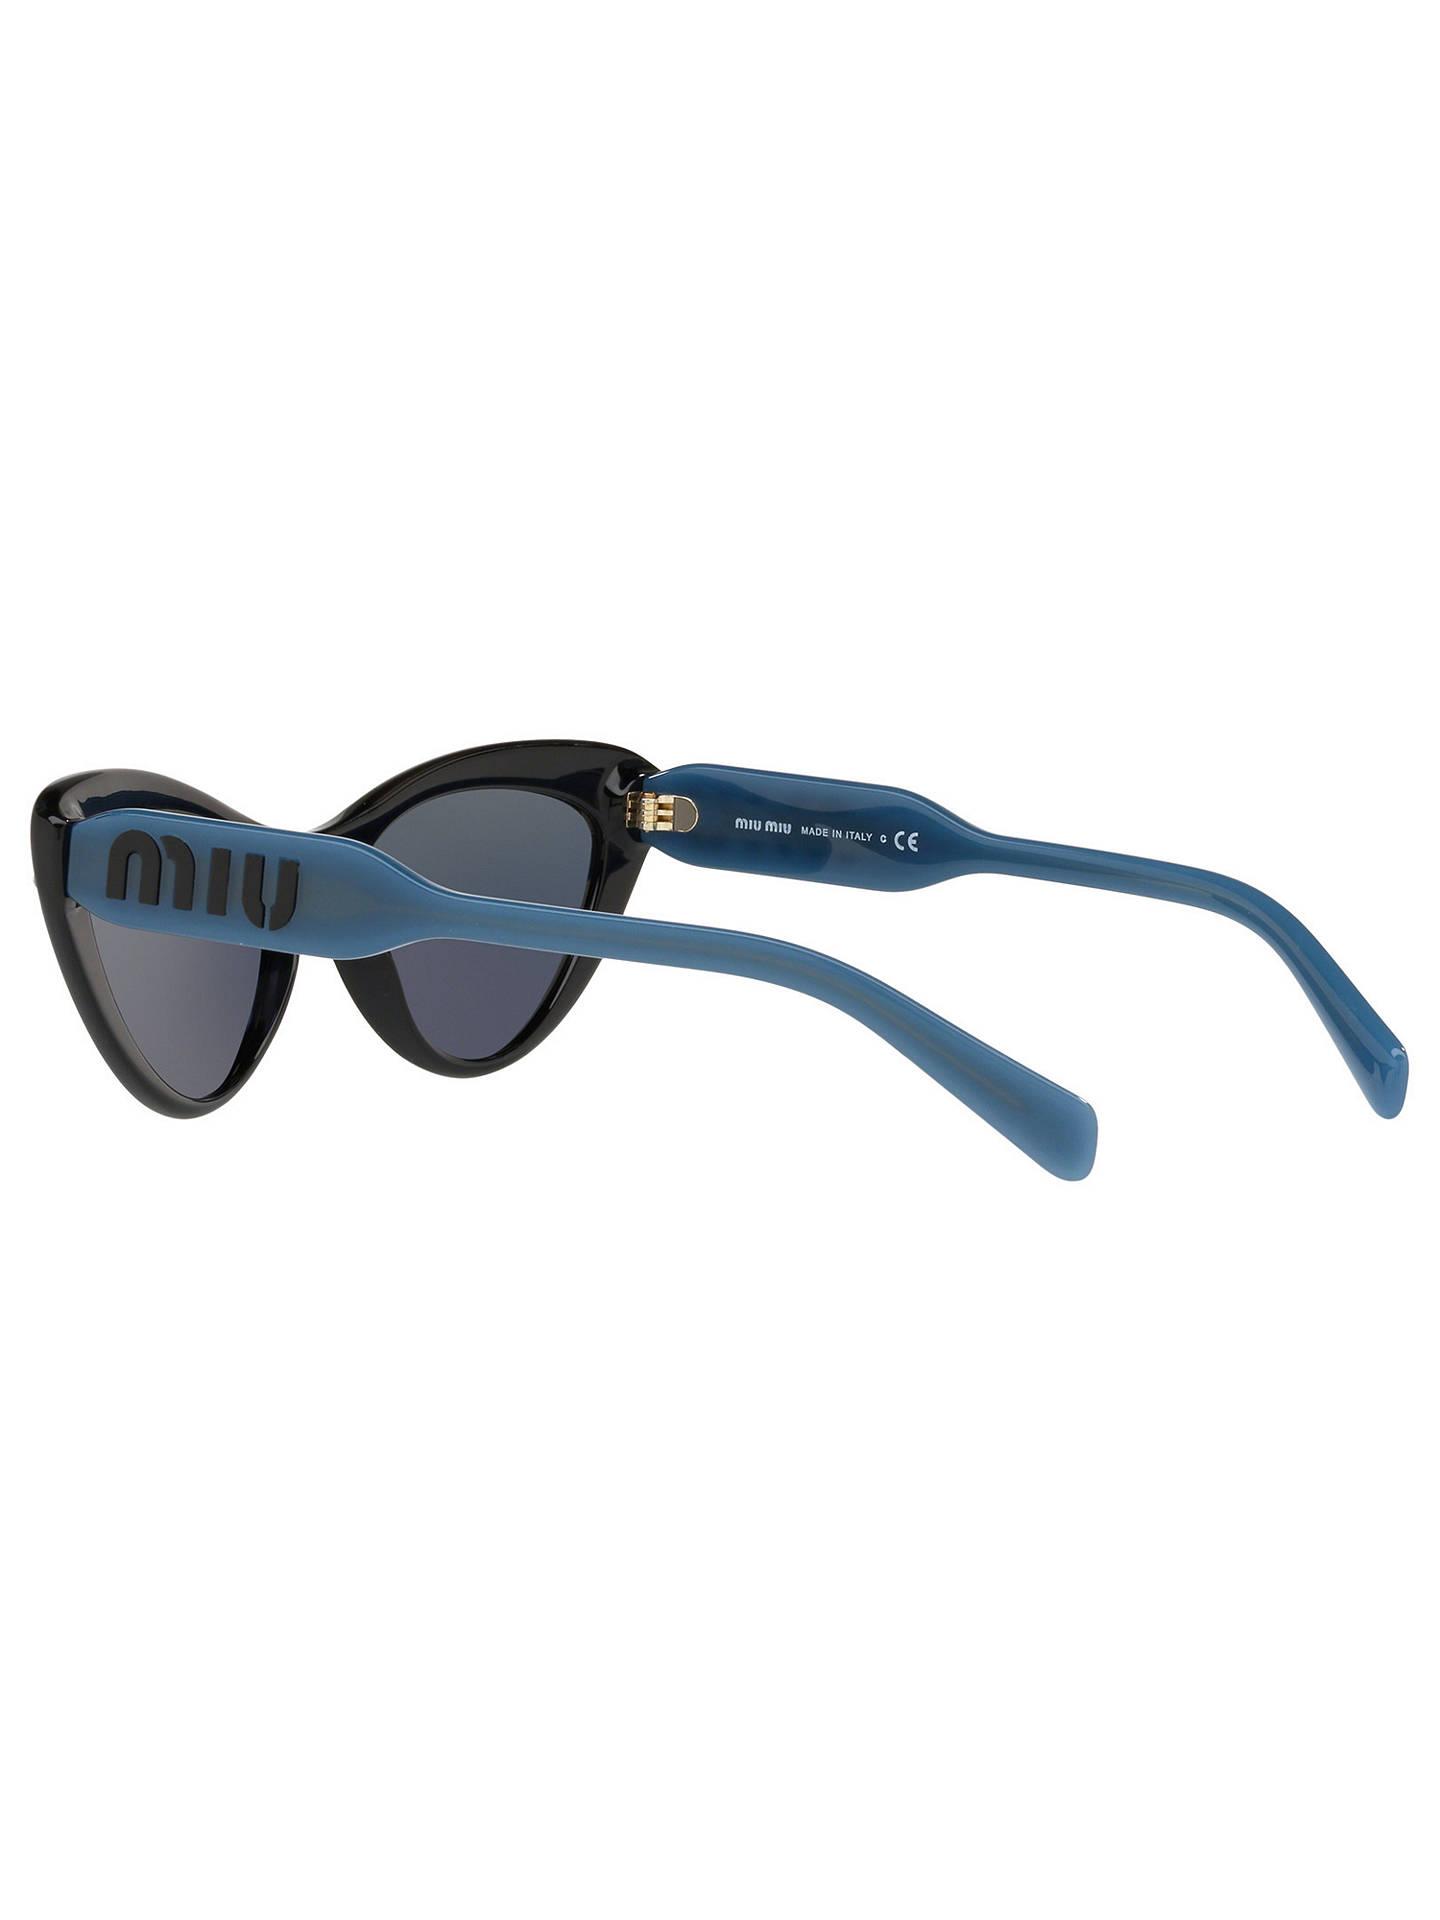 1a0514f30a ... Buy Miu Miu MU 05TS Women s Stud Cat s Eye Sunglasses